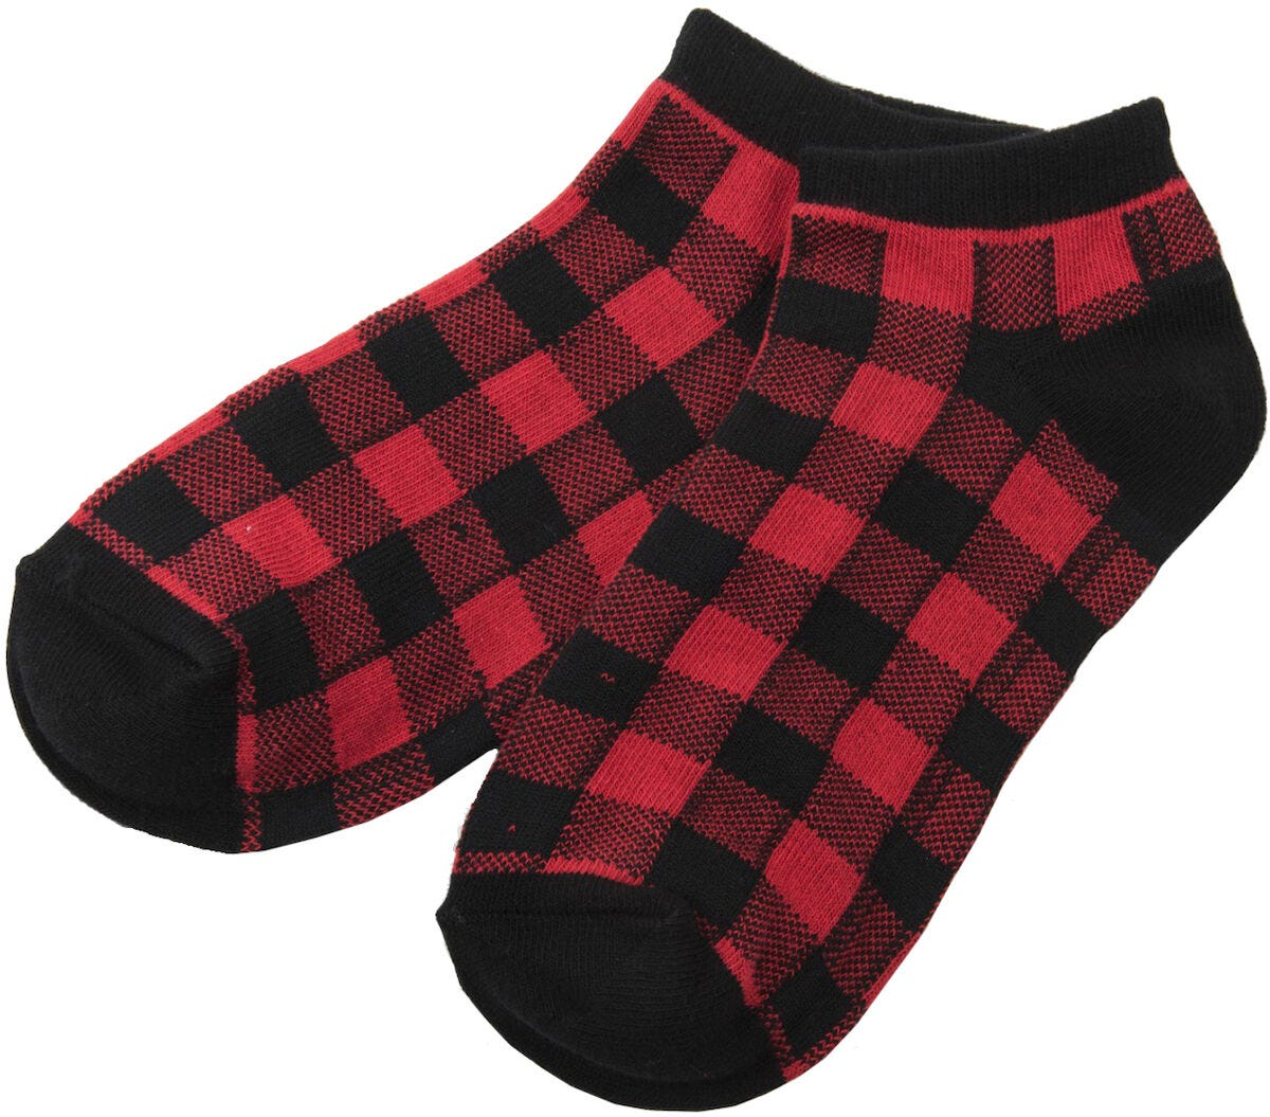 Printed Socks Training Warmer Ankle Running Outdoor Men Women Climbing